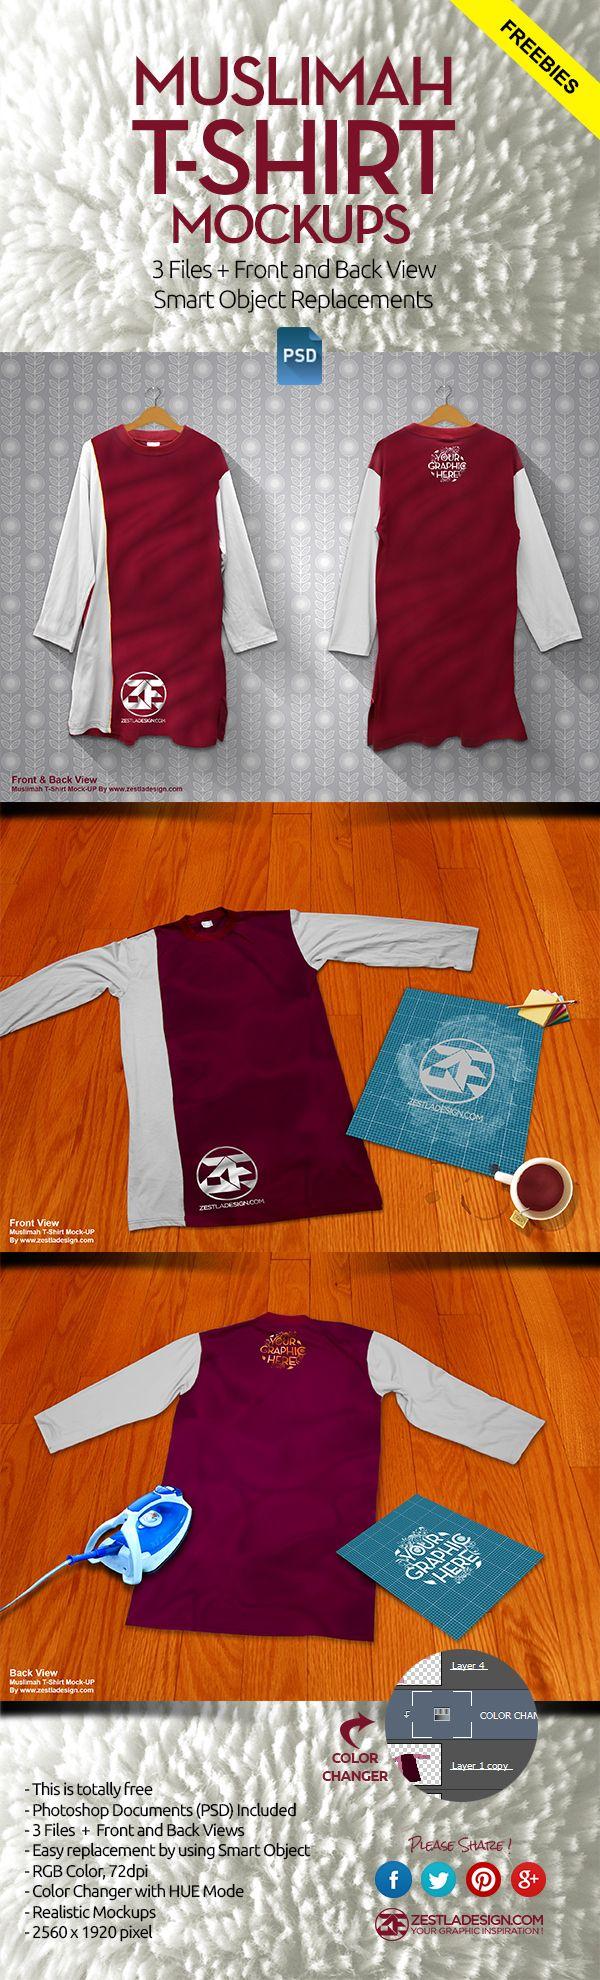 T-Shirt Muslimah Mockup (PREVIEW)